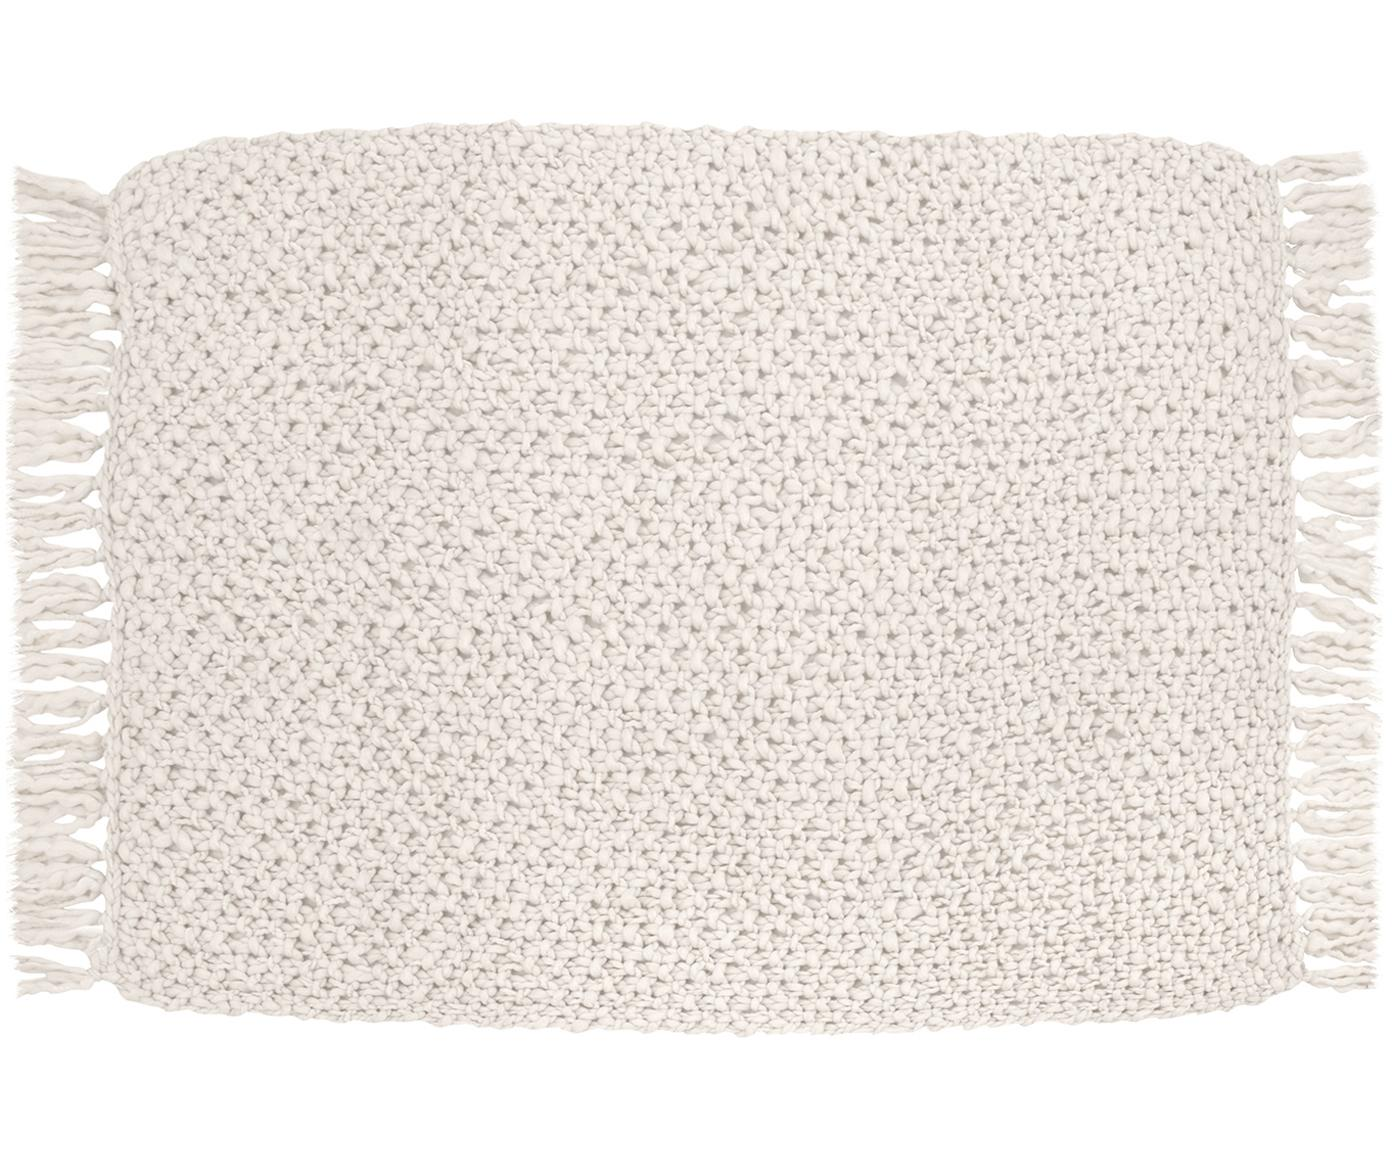 Manta de punto grueso Liva, 50%lana, 50%acrílico Con un tacto ligeramente aspero, Blanco natural, An 130 x L 170 cm